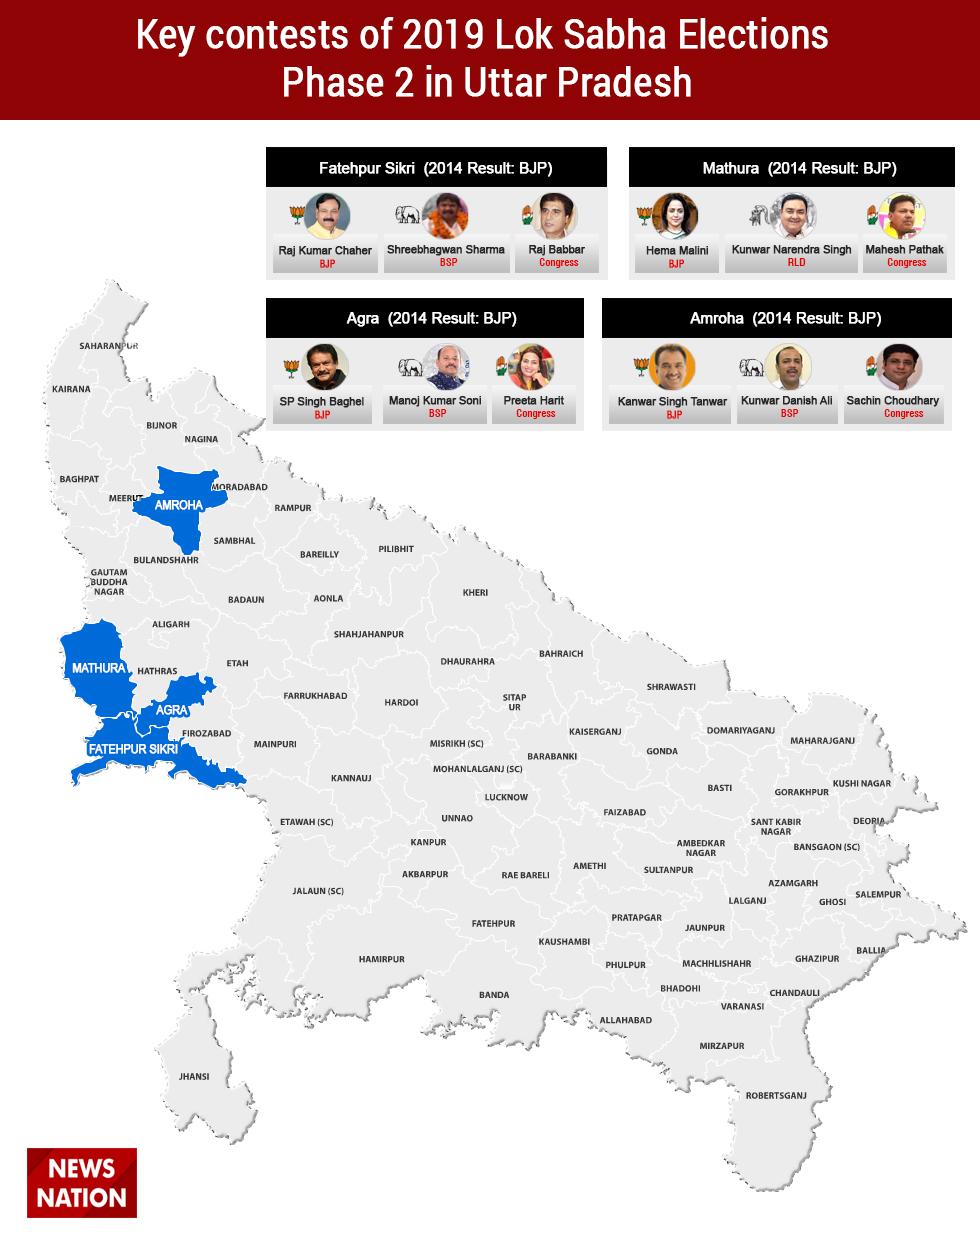 Lok Sabha Polls 2019: From Hema Malini to Raj Babbar, key